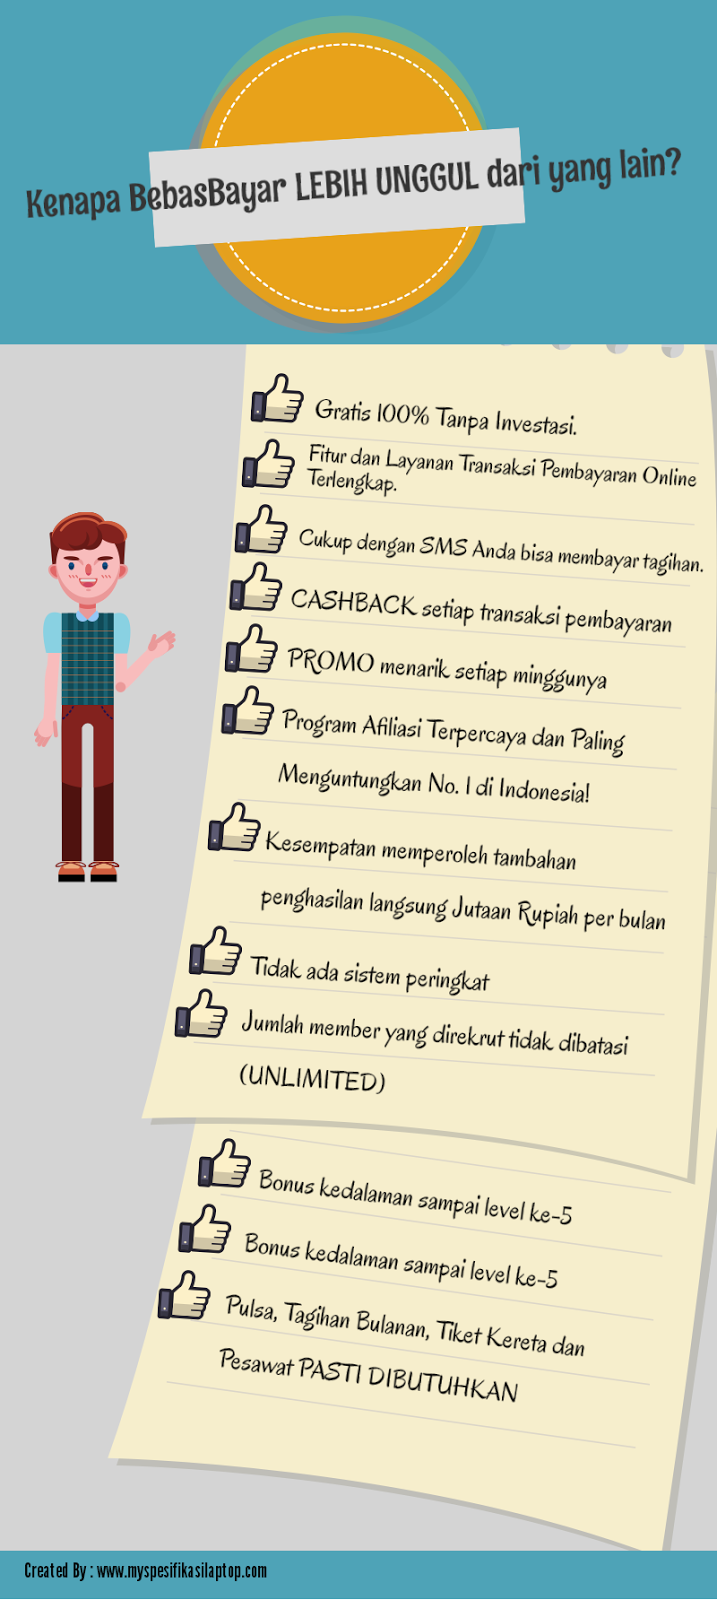 Cara Mudah Membayar Tagihan Bulanan dengan BebasBayar.com